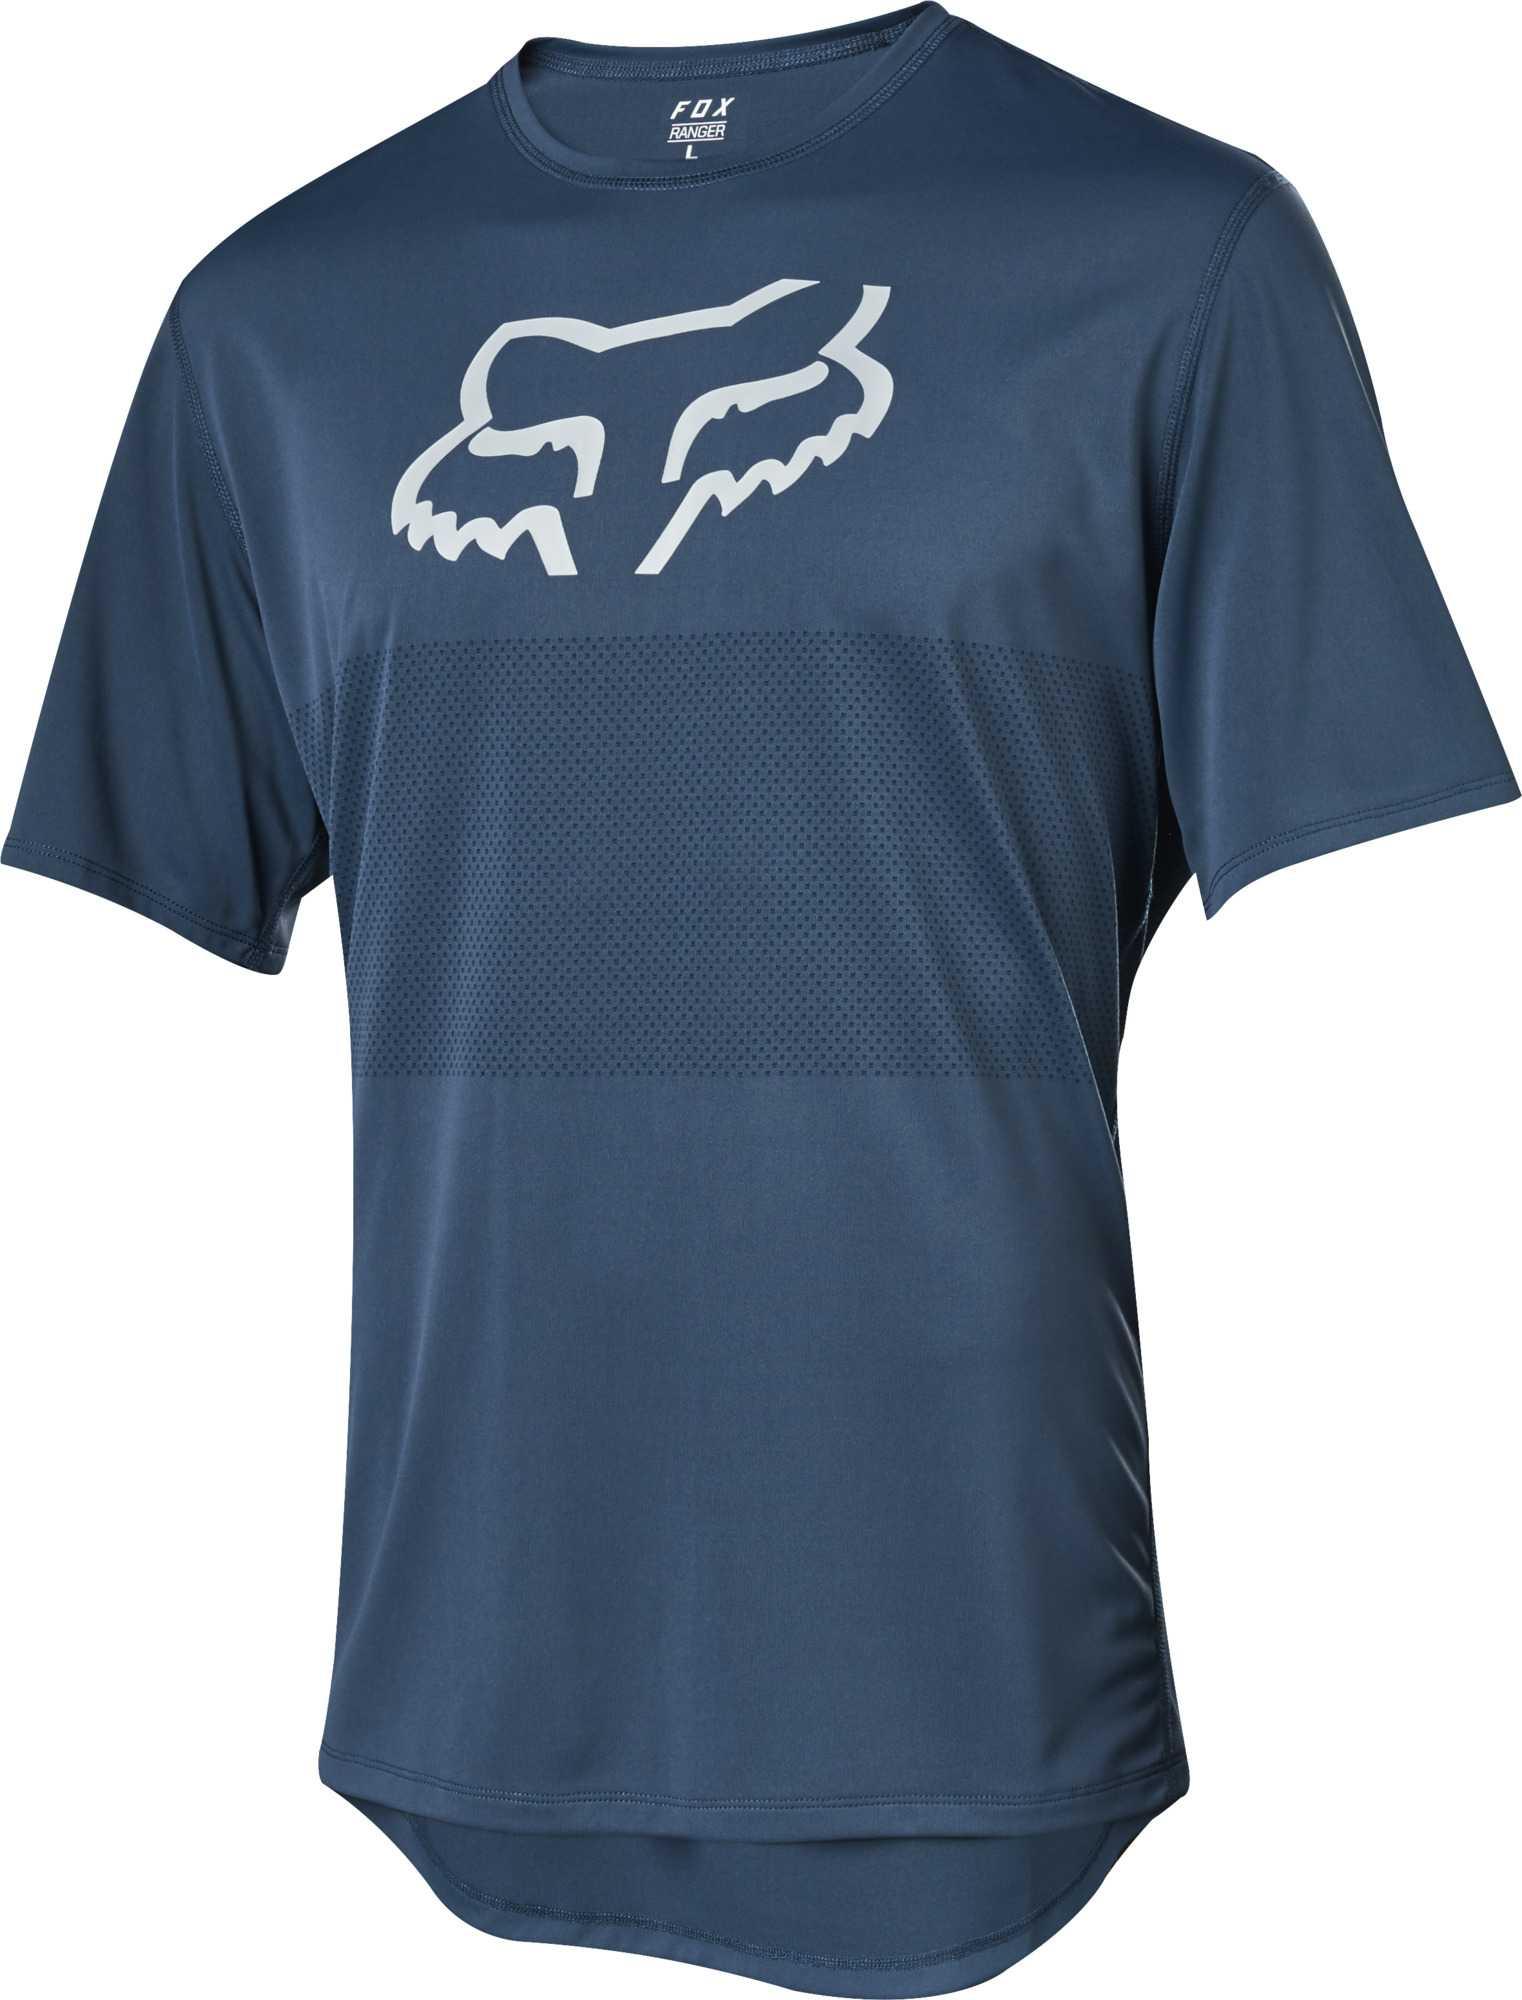 Trøje Fox Ranger Foxhead SS blå   Jerseys